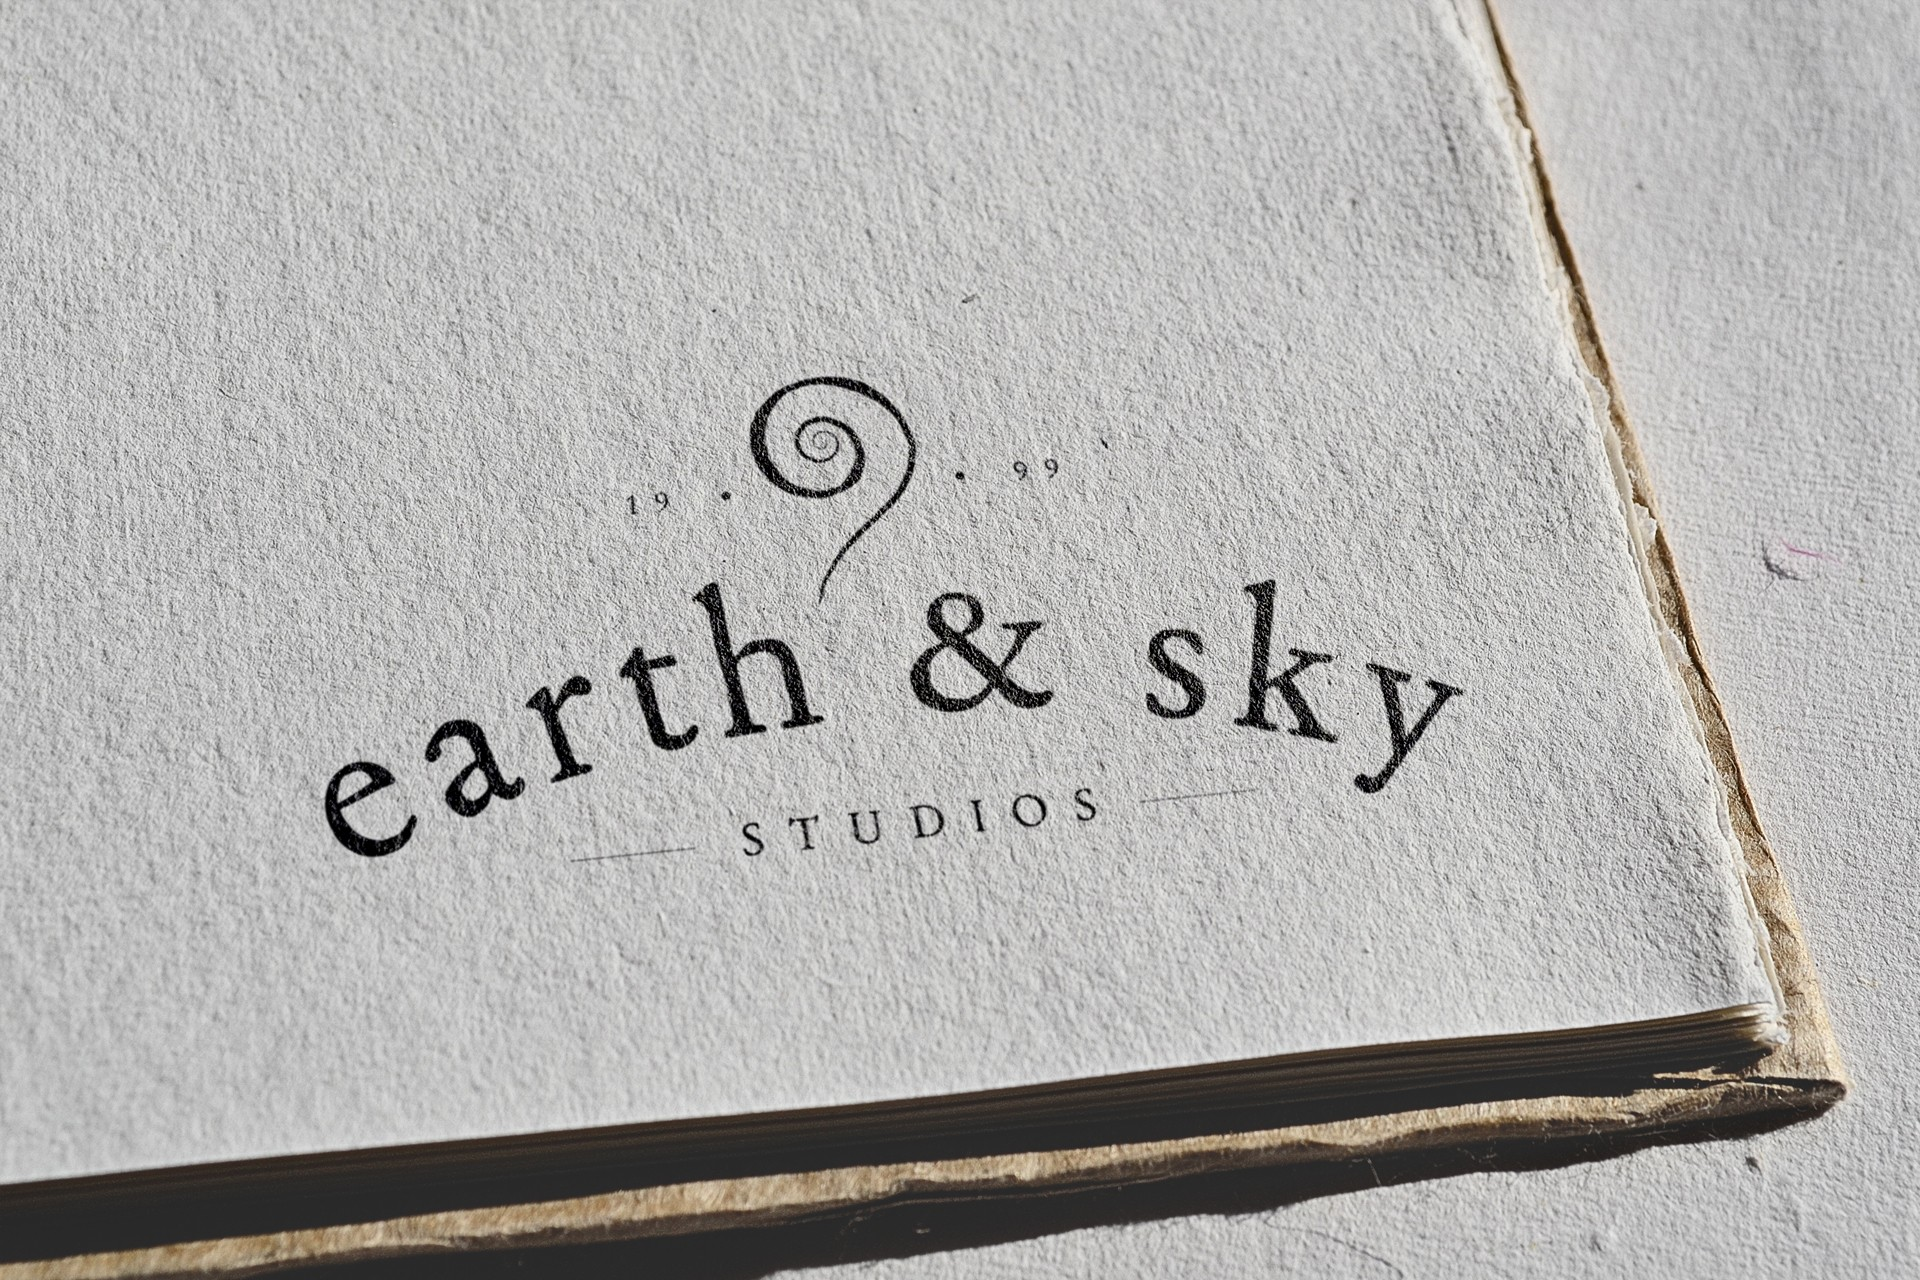 Earth & Sky Studios, LLC